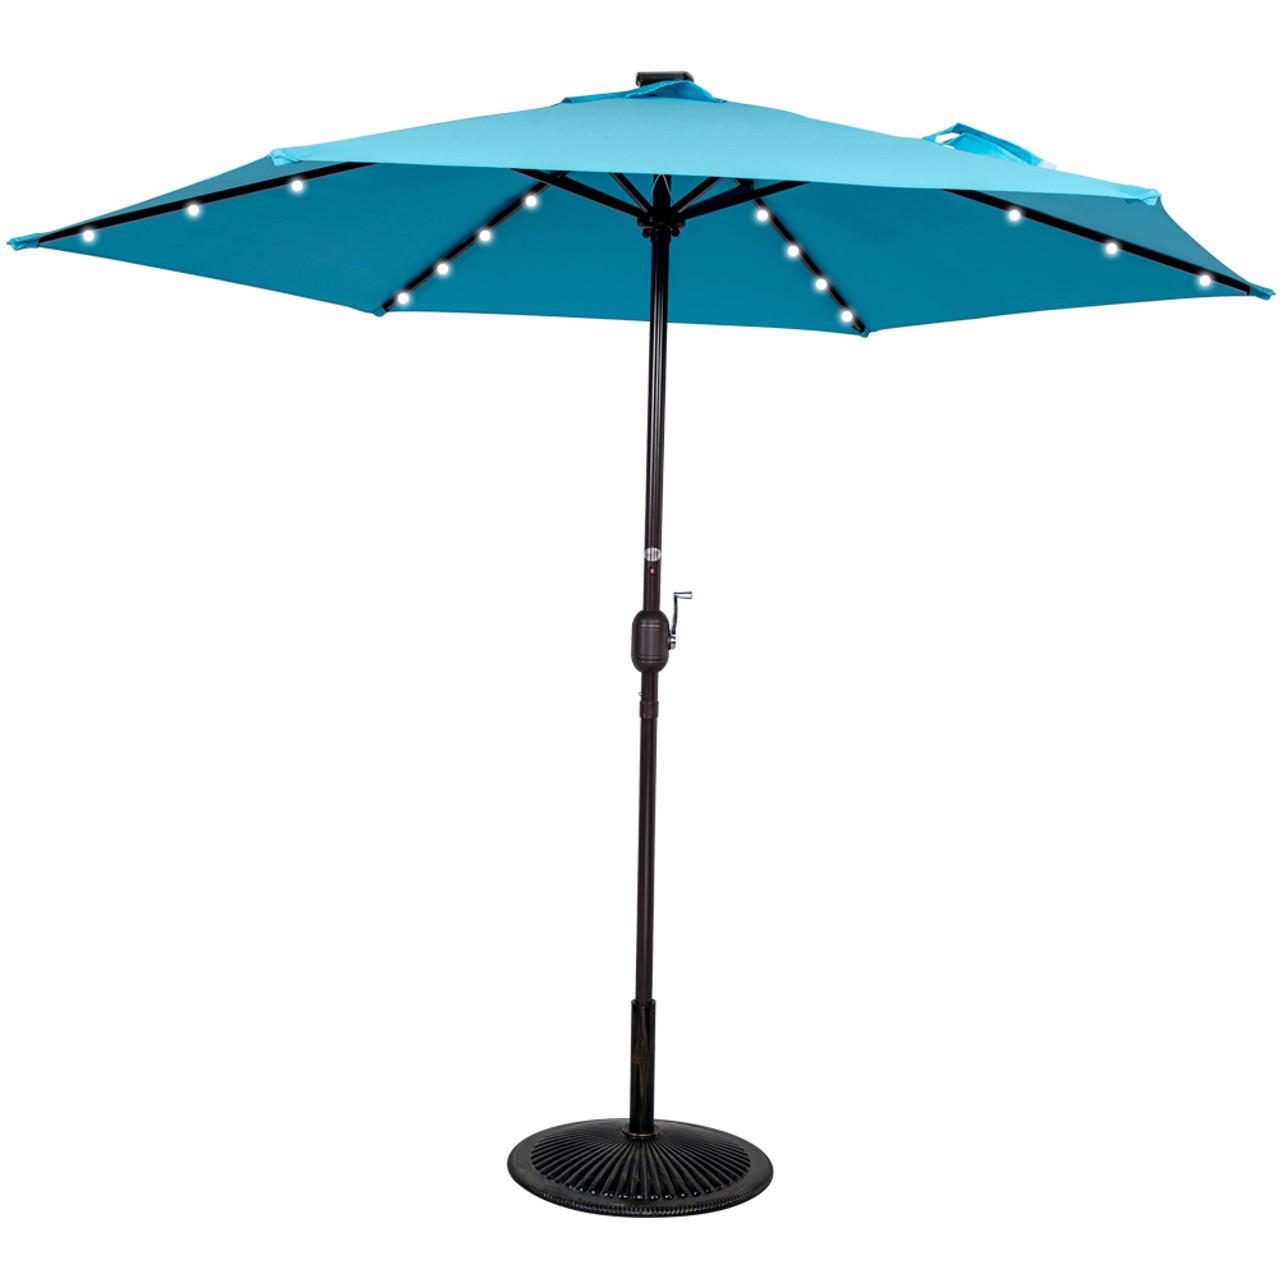 sun cafe pool pole shade umbrella outdoor n ribs itm wood wooden garden patio